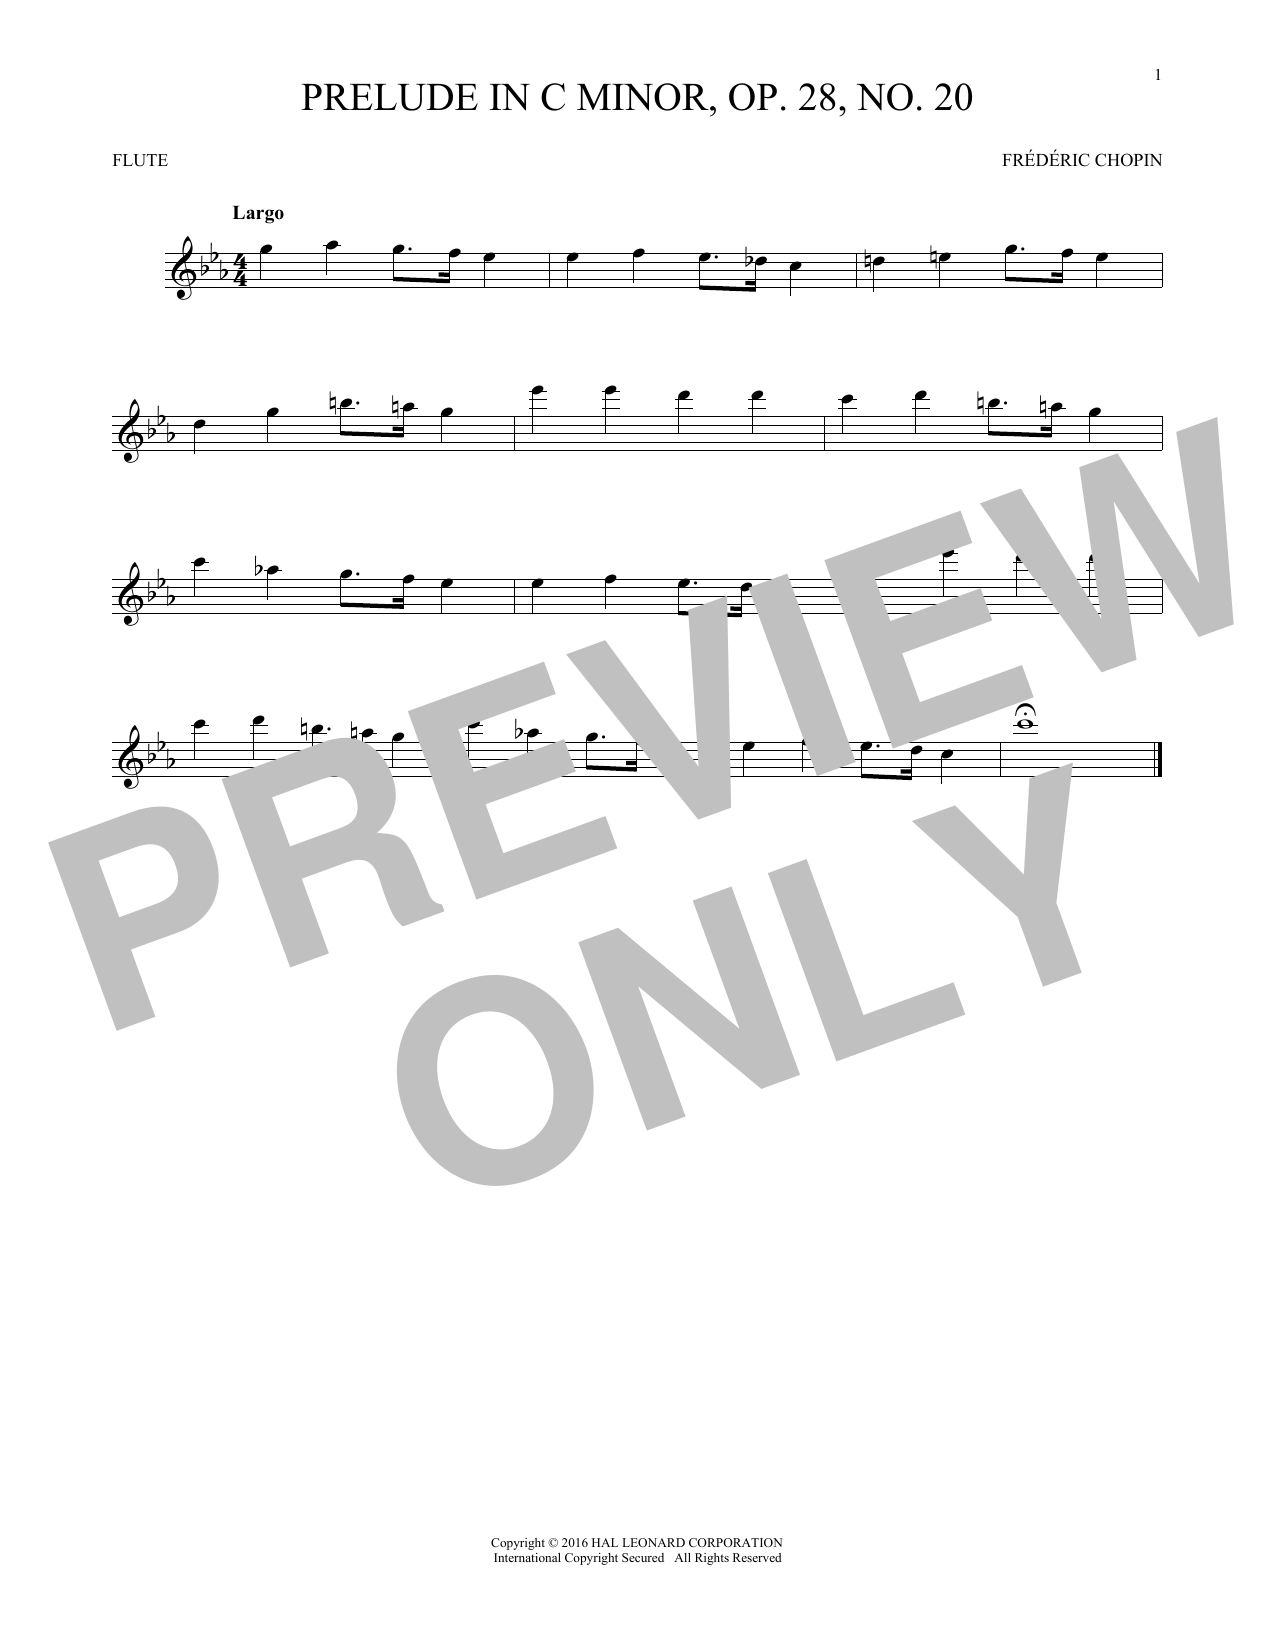 Prelude, Op. 28, No. 20 (Flute Solo)